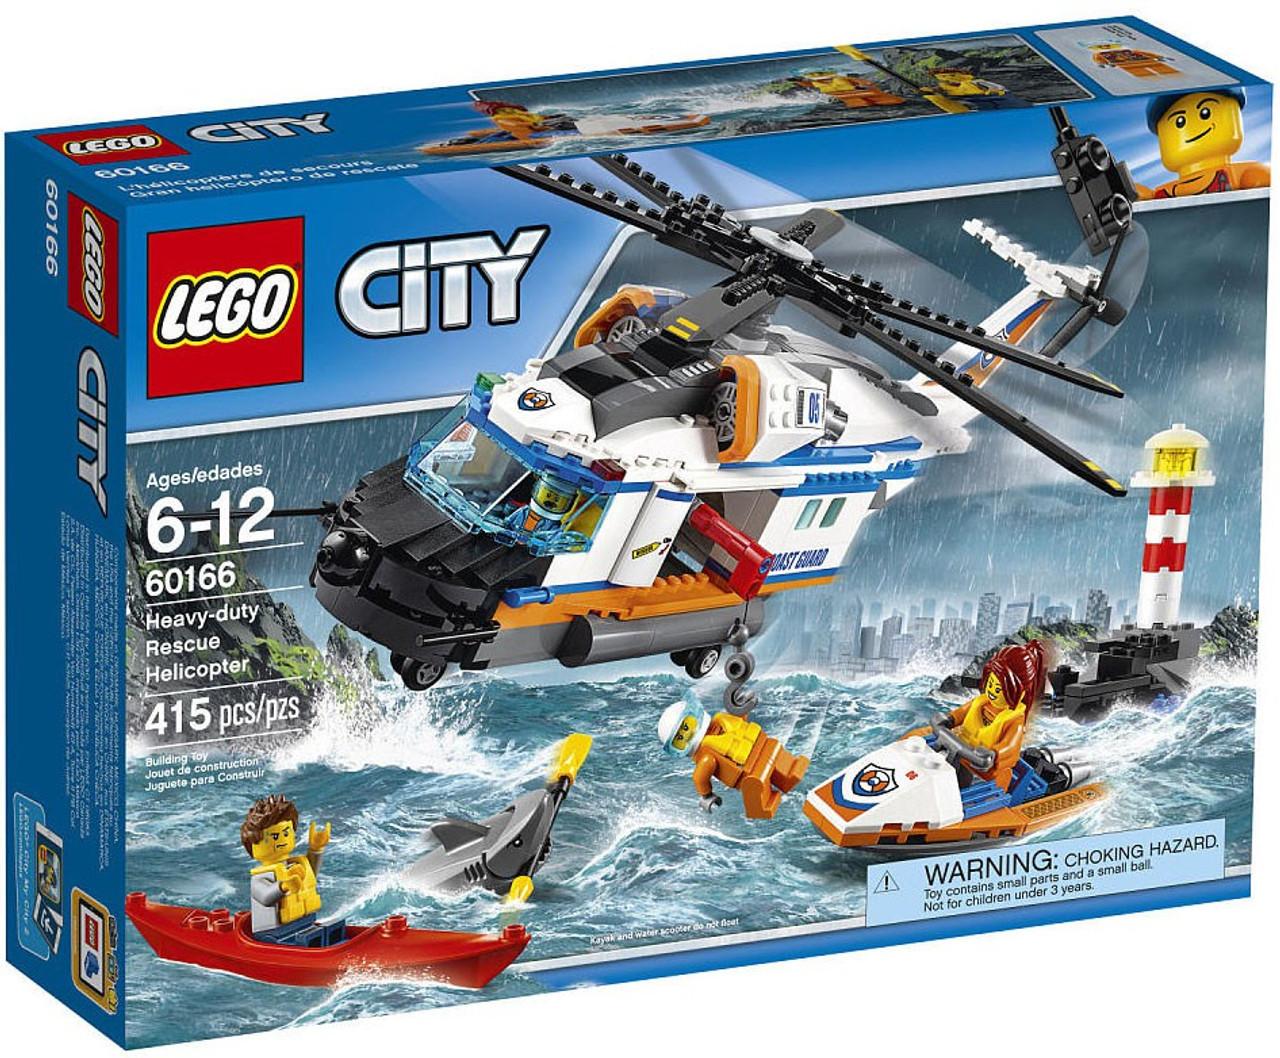 LEGO City Heavy-Duty Rescue Helicopter Set 60166 - ToyWiz